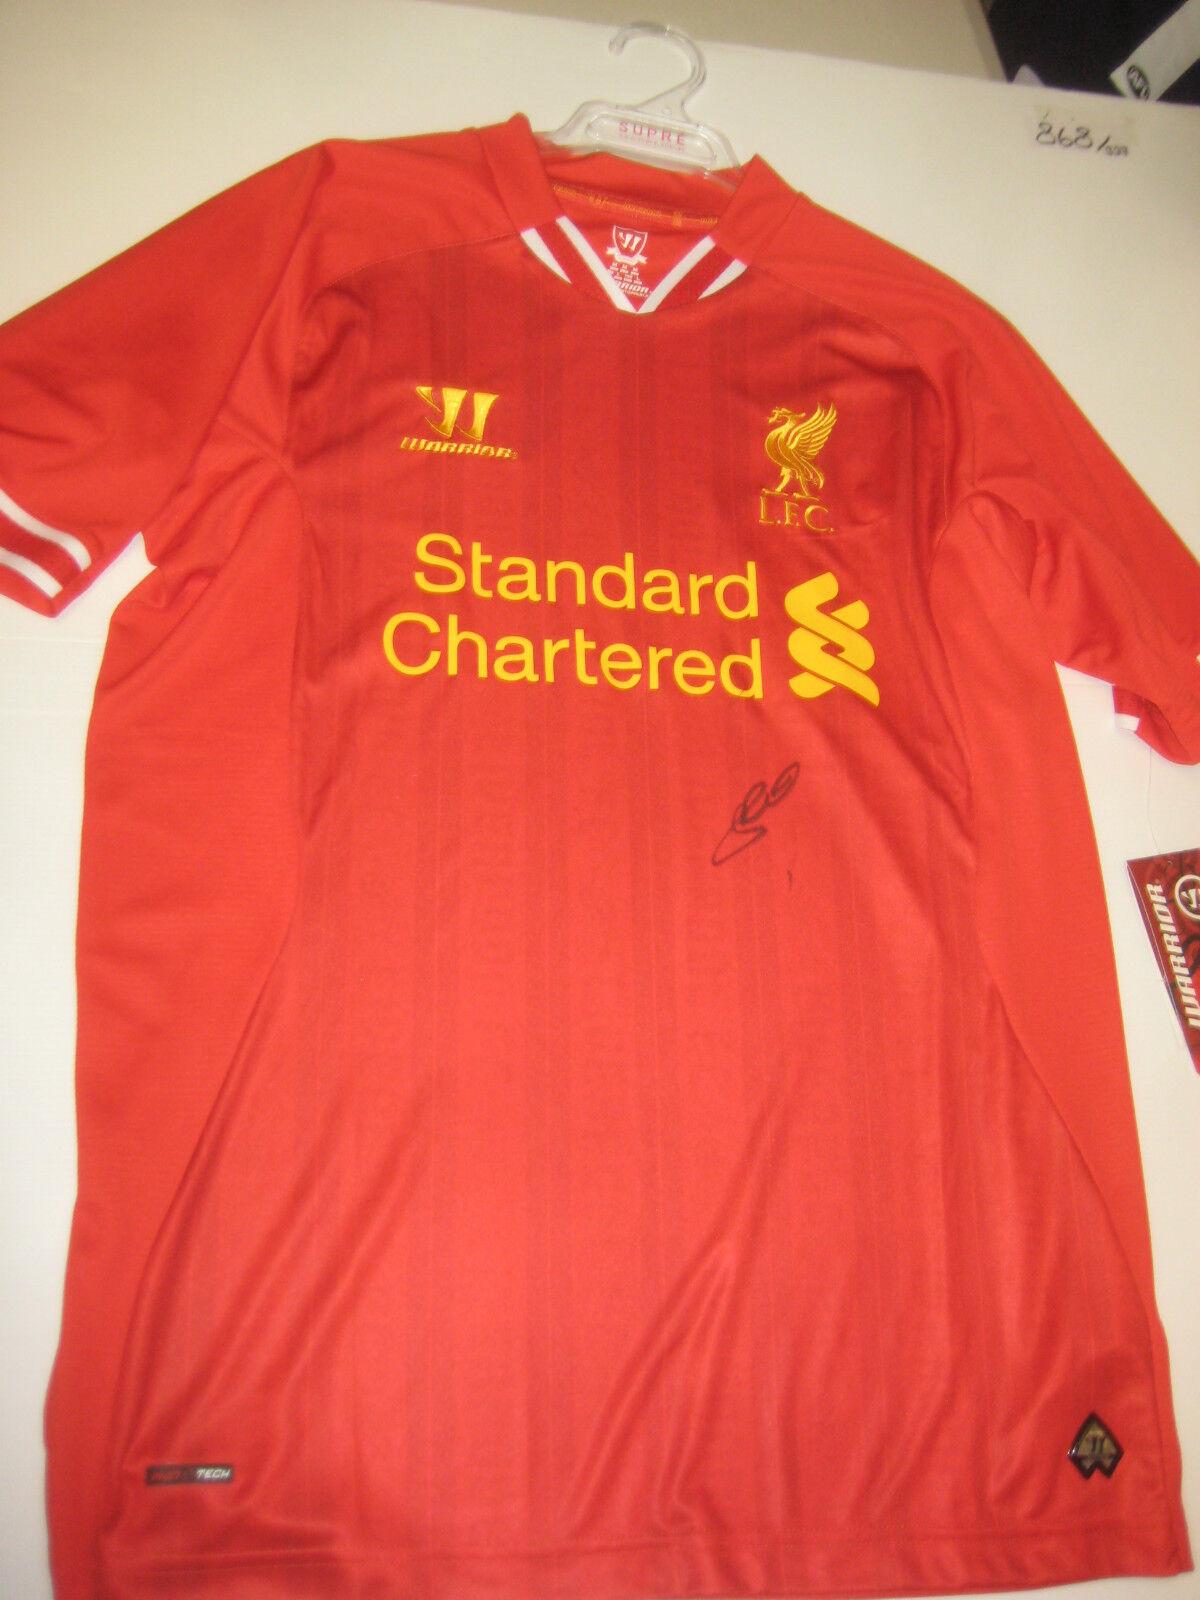 Liverpool-Steven Gerrard Firmado 2013-14 Camiseta + + prueba fotográfica C.o.a